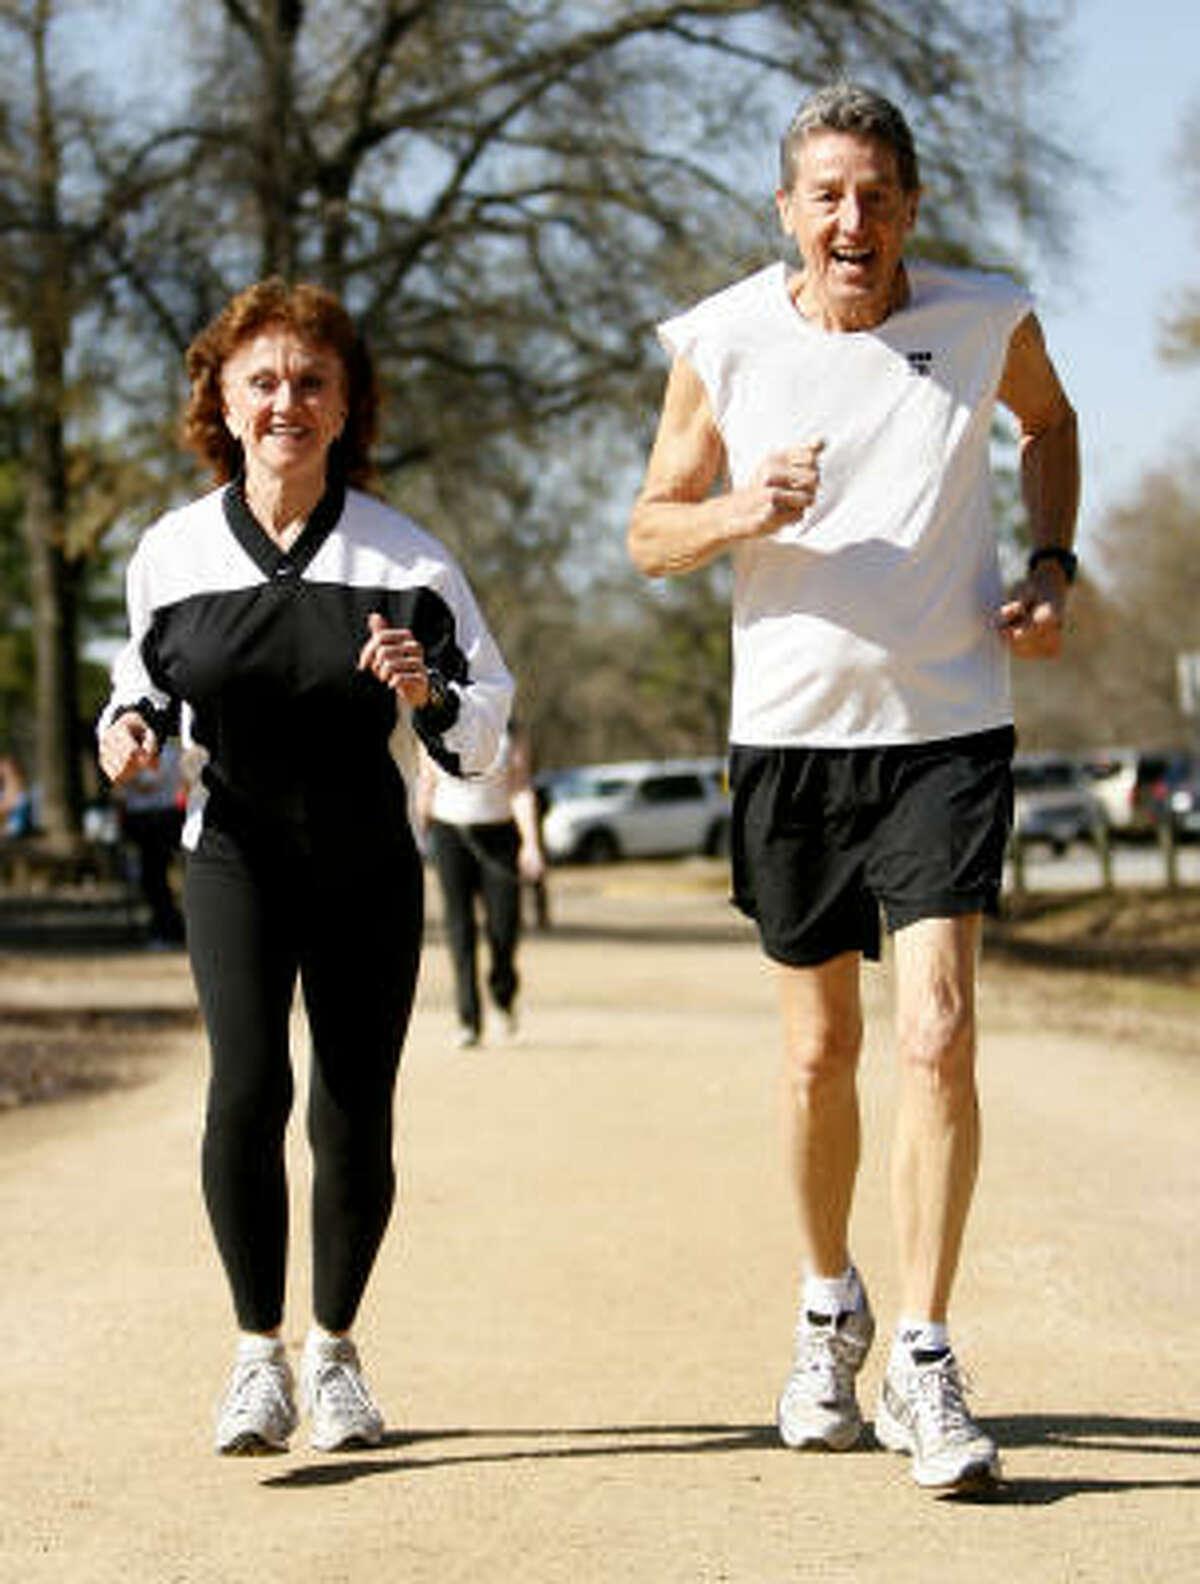 Judy Loy, left, and John Fredrickson, both 71, are ready for Sunday's Chevron Houston Marathon. It will be Fredrickson's 100th marathon since he took up jogging 21 years ago.